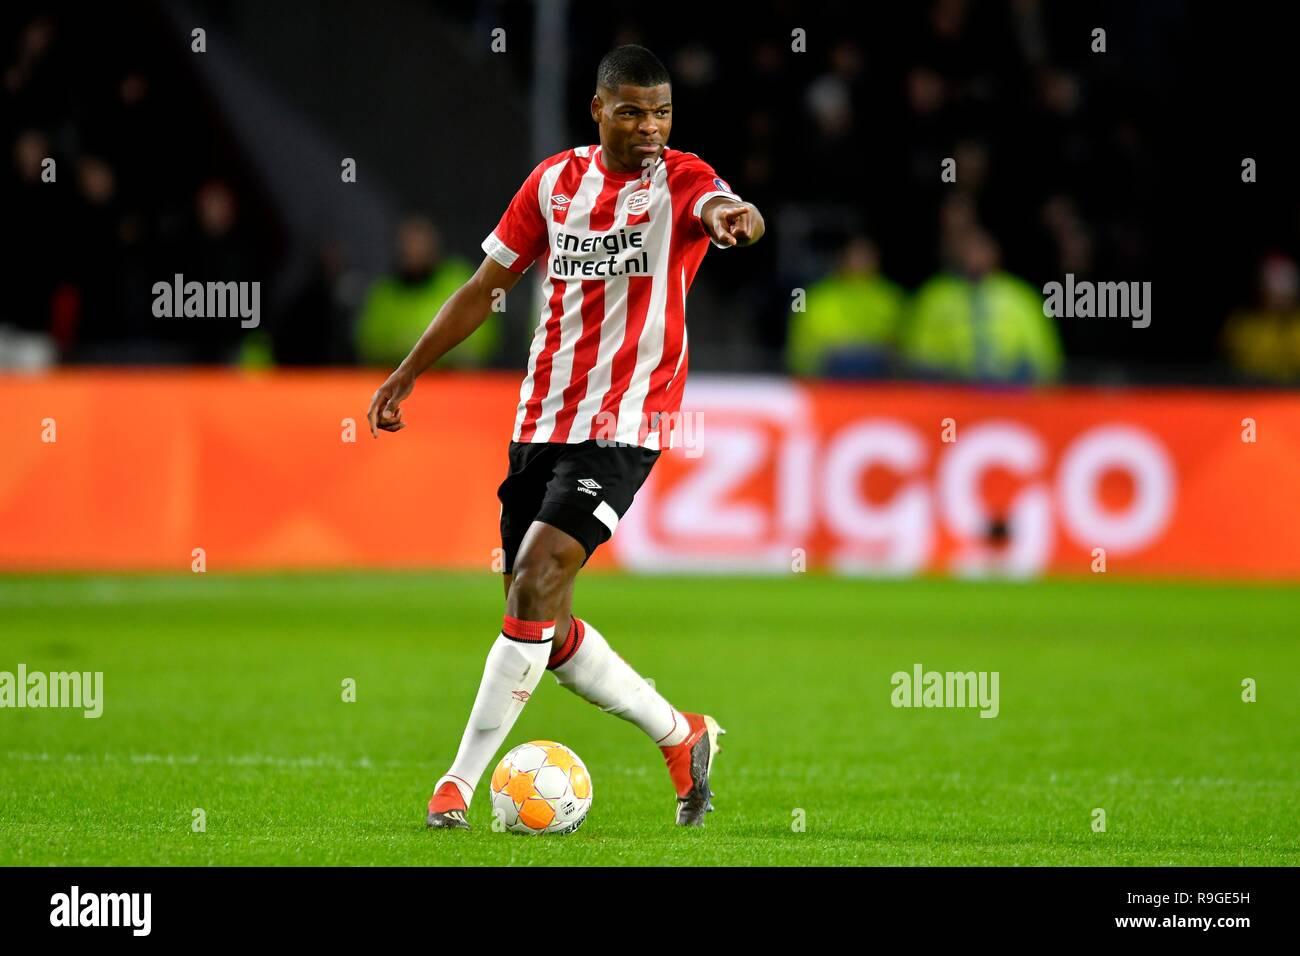 22-12-2018 FOOTBALL: PREMIER DIVISON: PSV-AZ: EINDHOVEN VOETBAL: EREDIVISIE: Denzel Dumfries (PSV) Photo: Sander Chamid/AFLO - Stock Image